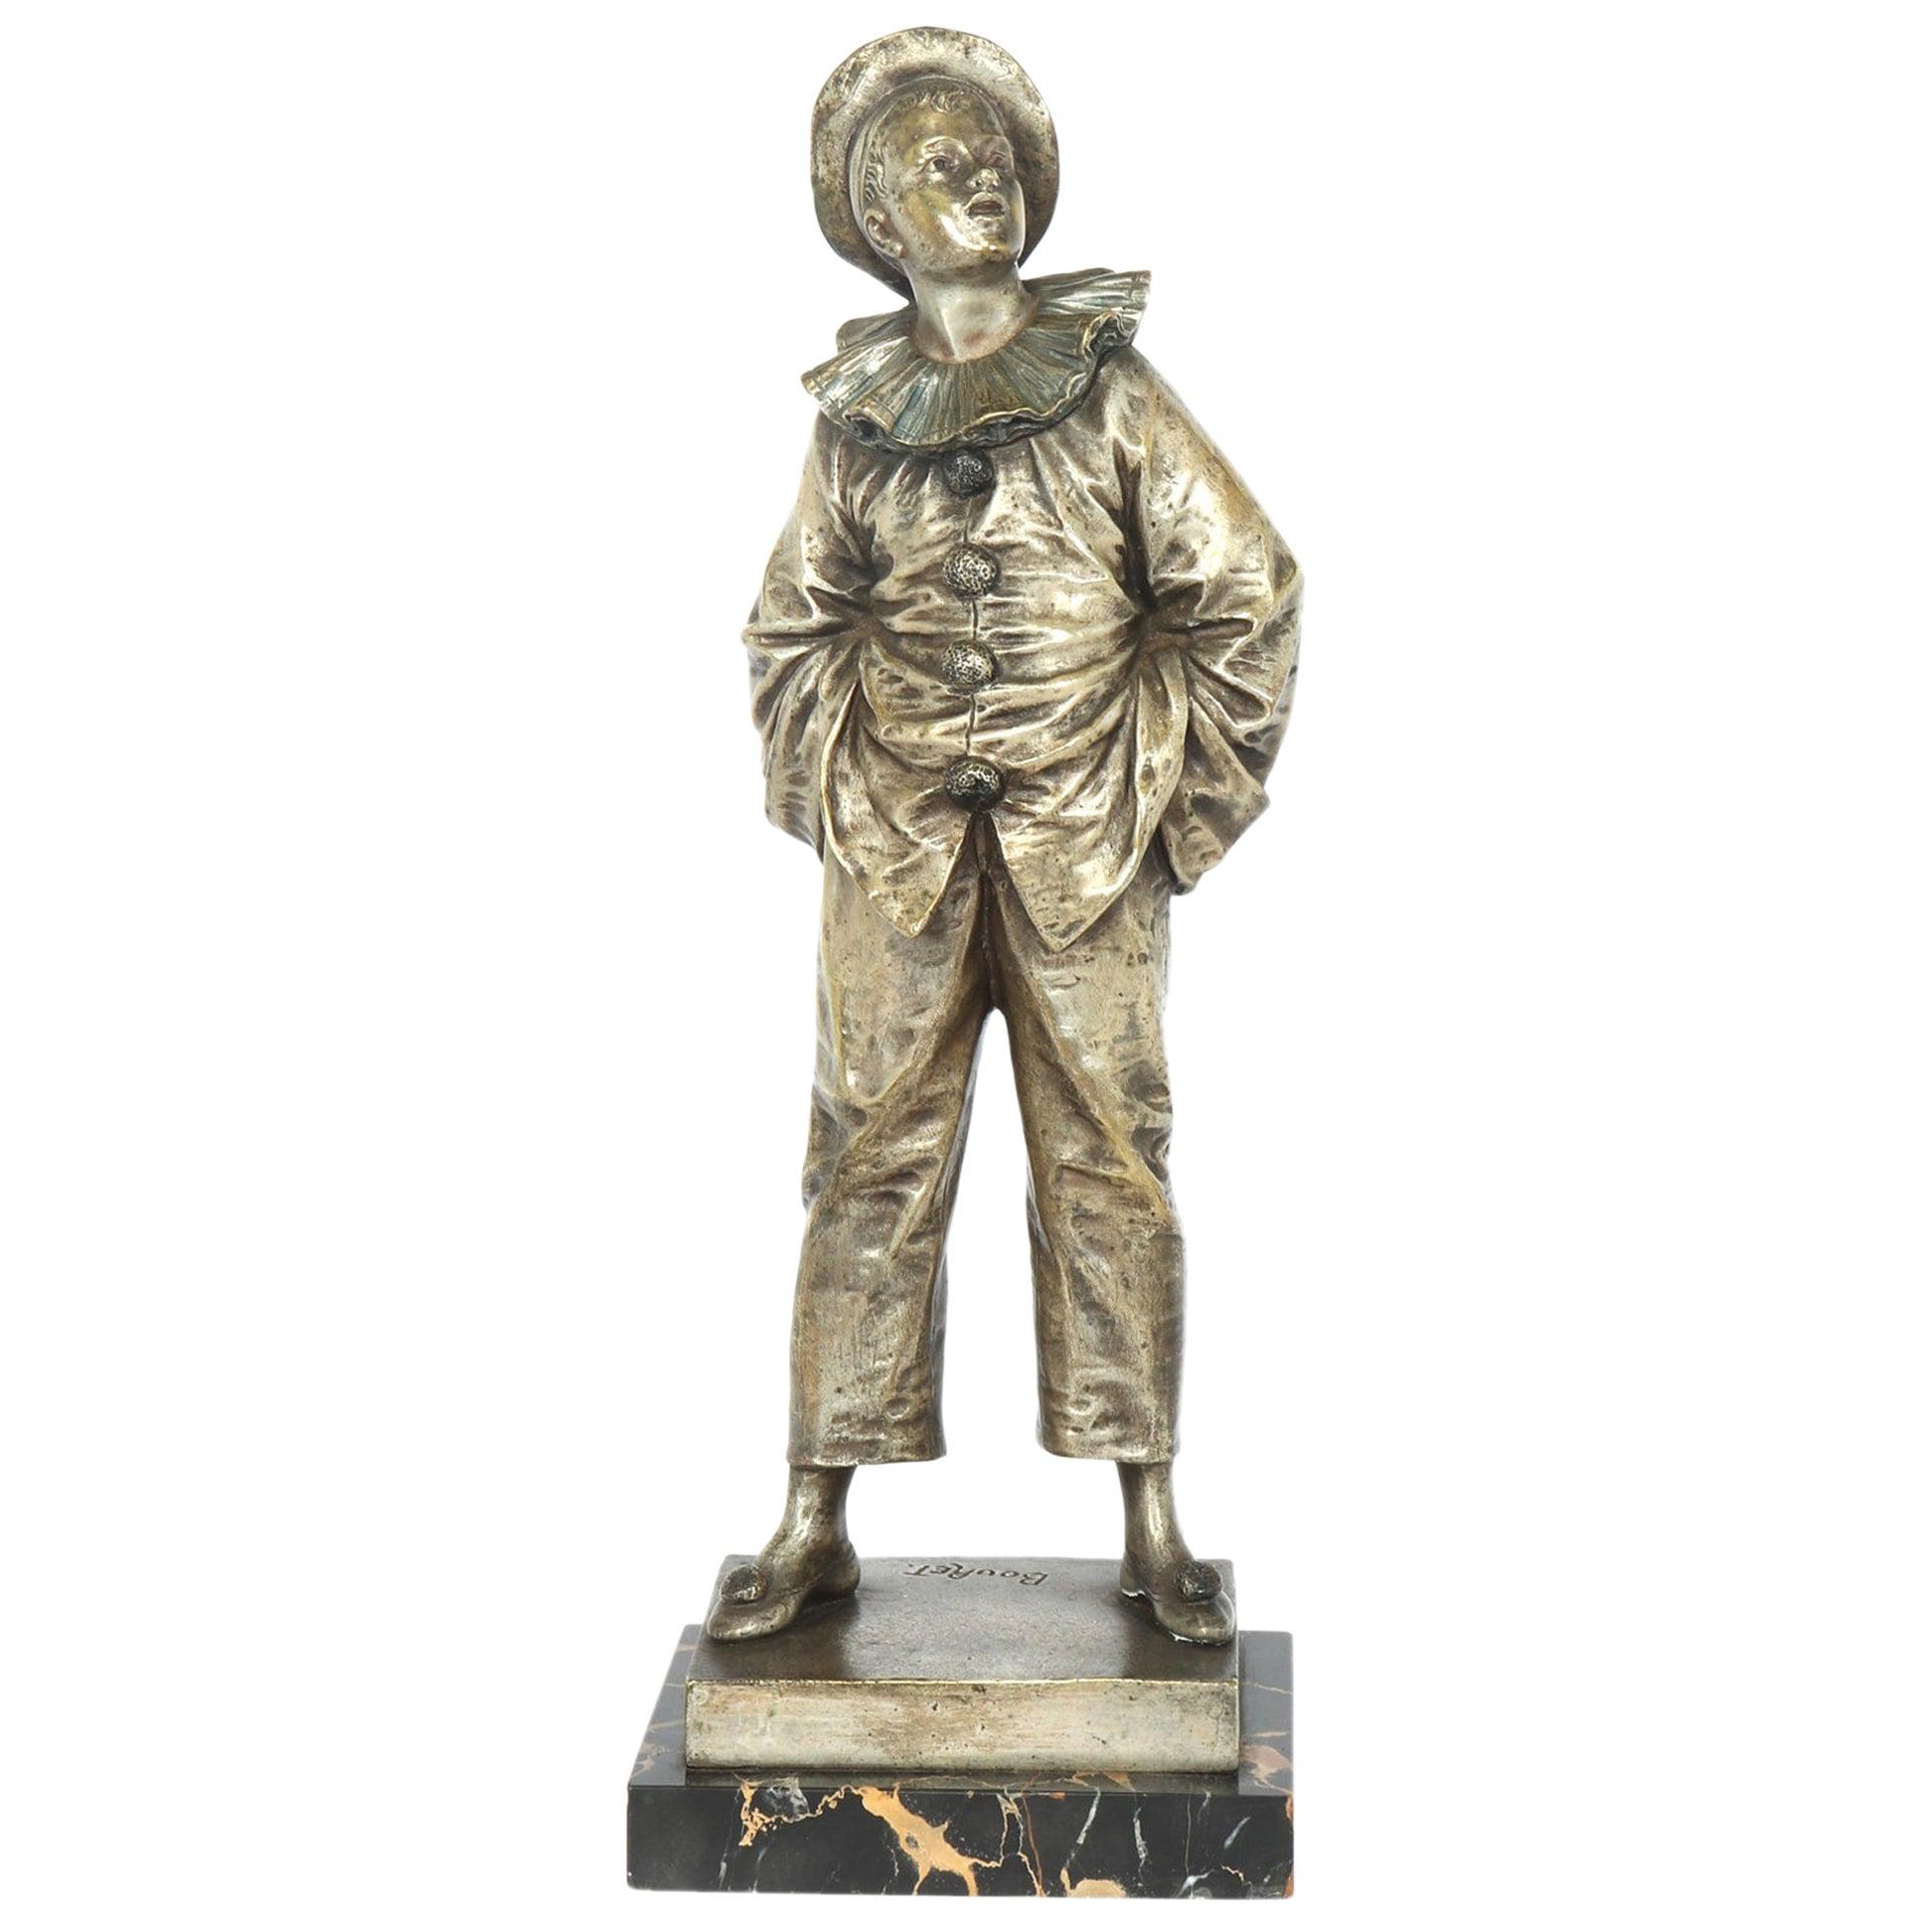 French Silver Gilt Bronze Sculpture by Bouret, c1890